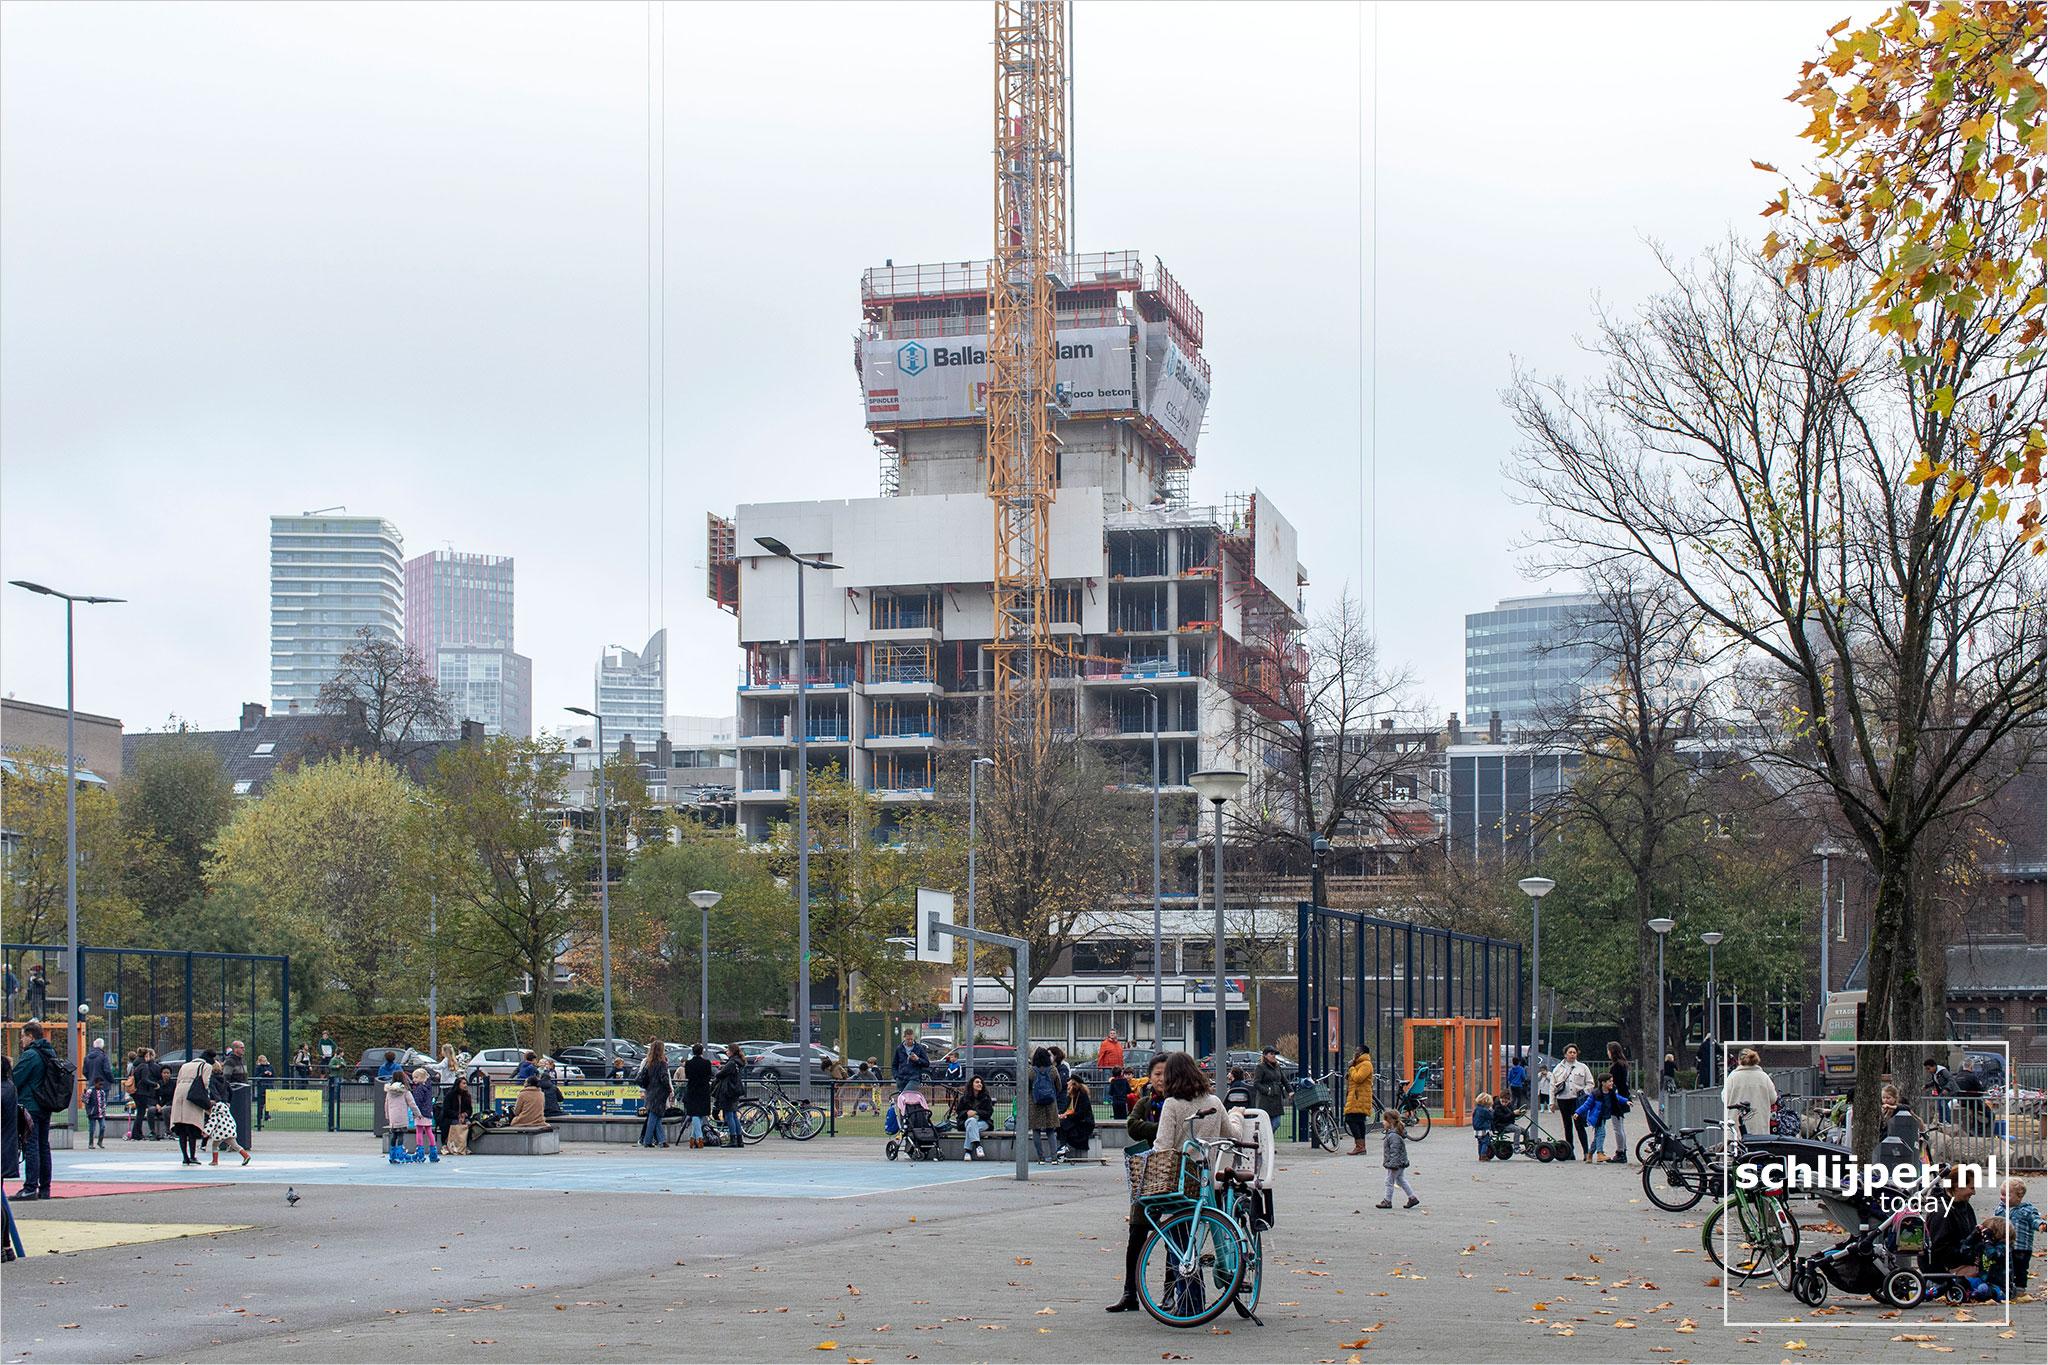 Nederland, Rotterdam, 11 november 2020